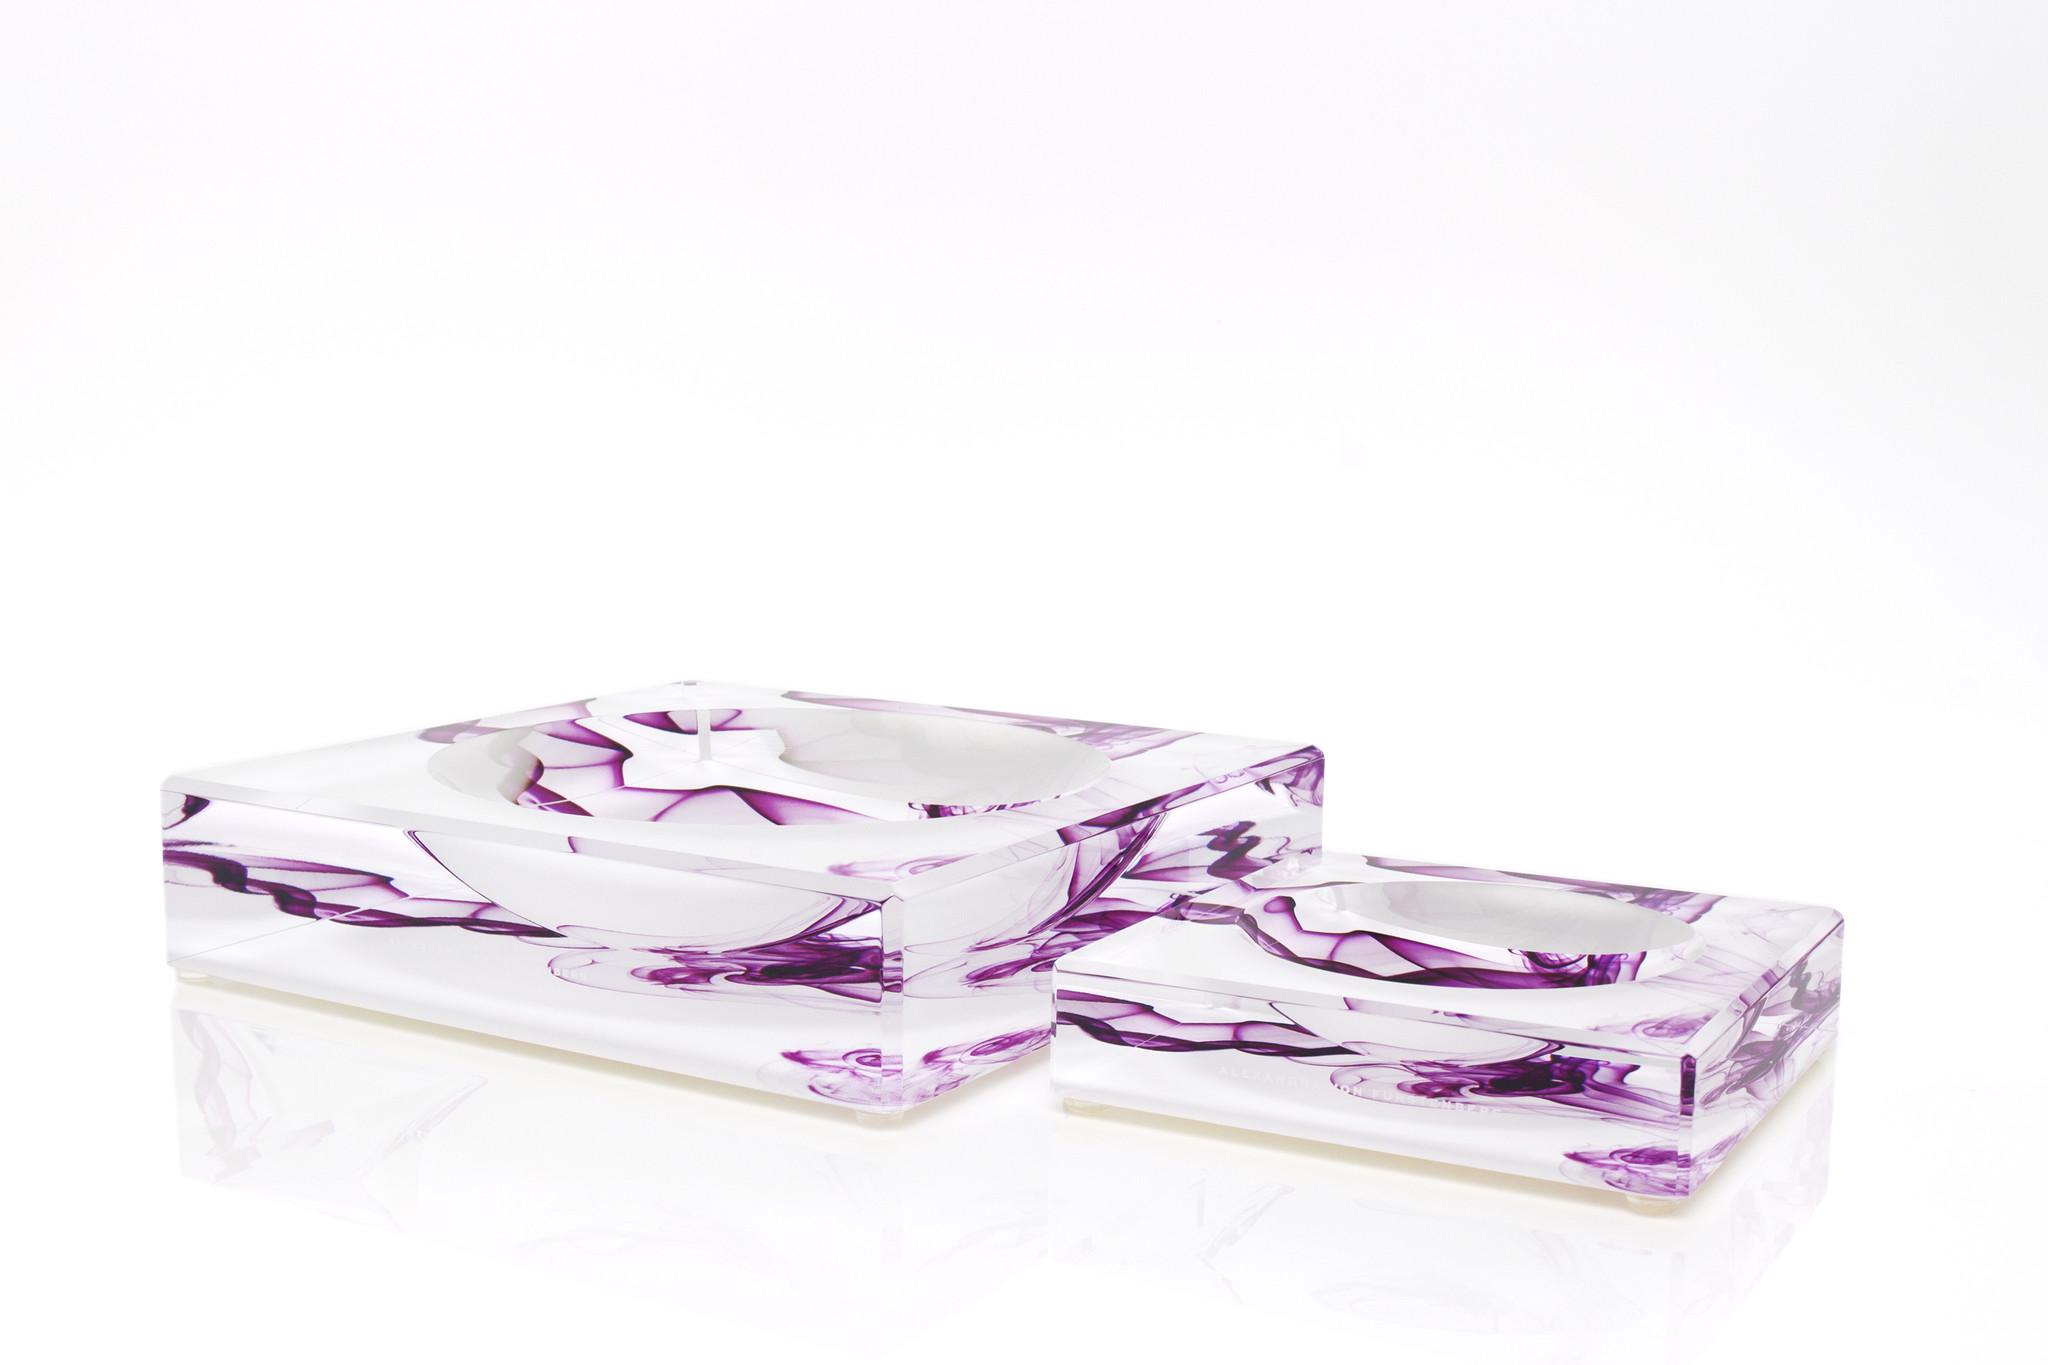 Alexandra Von Furstenberg Large Candy Bowl in Magenta Smoke Print